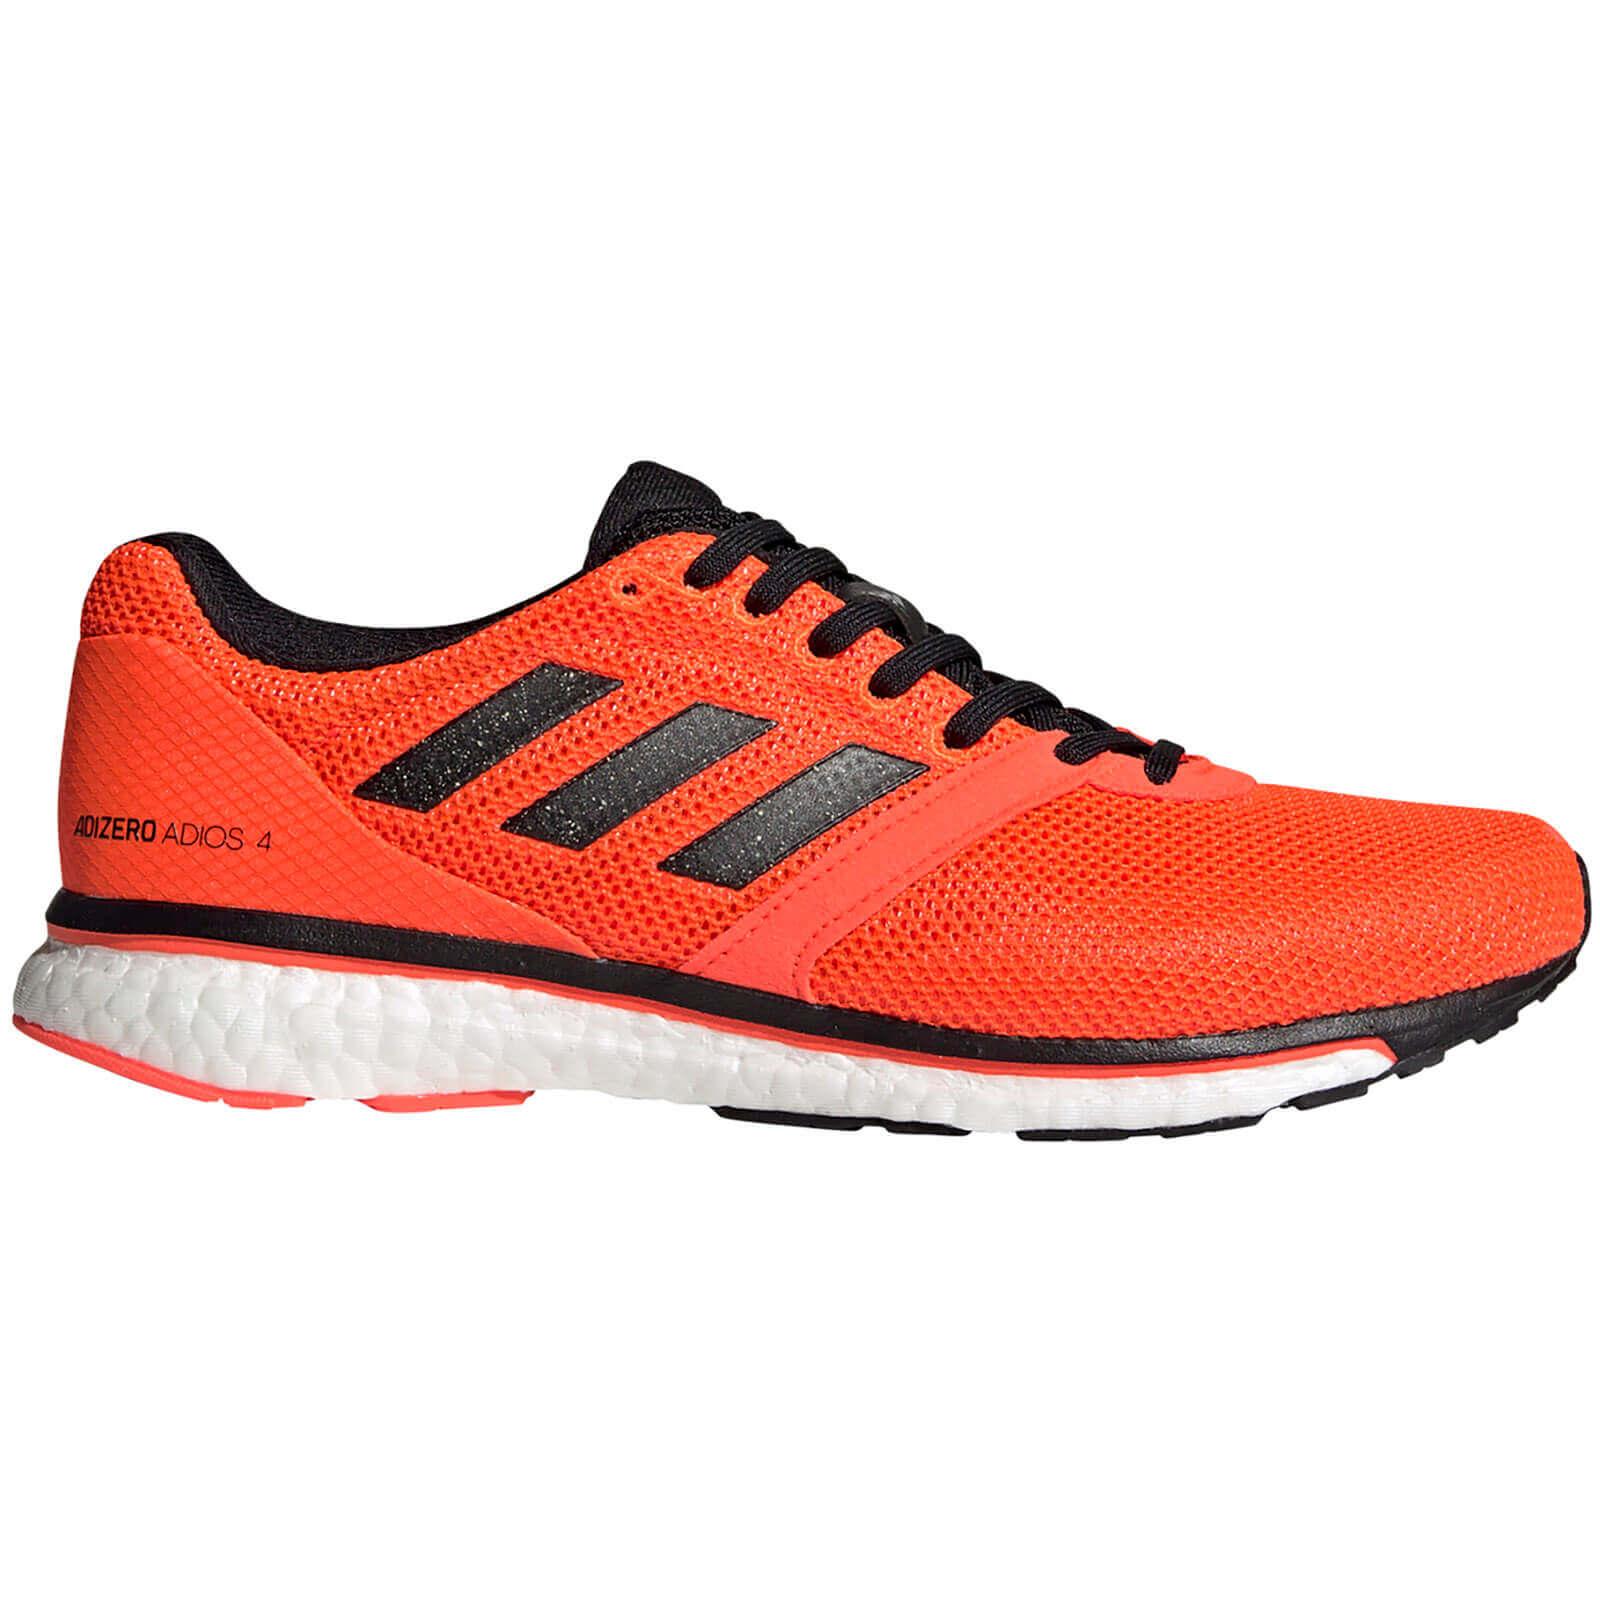 Men's Adidas Adios 4 - John Buckley Sports